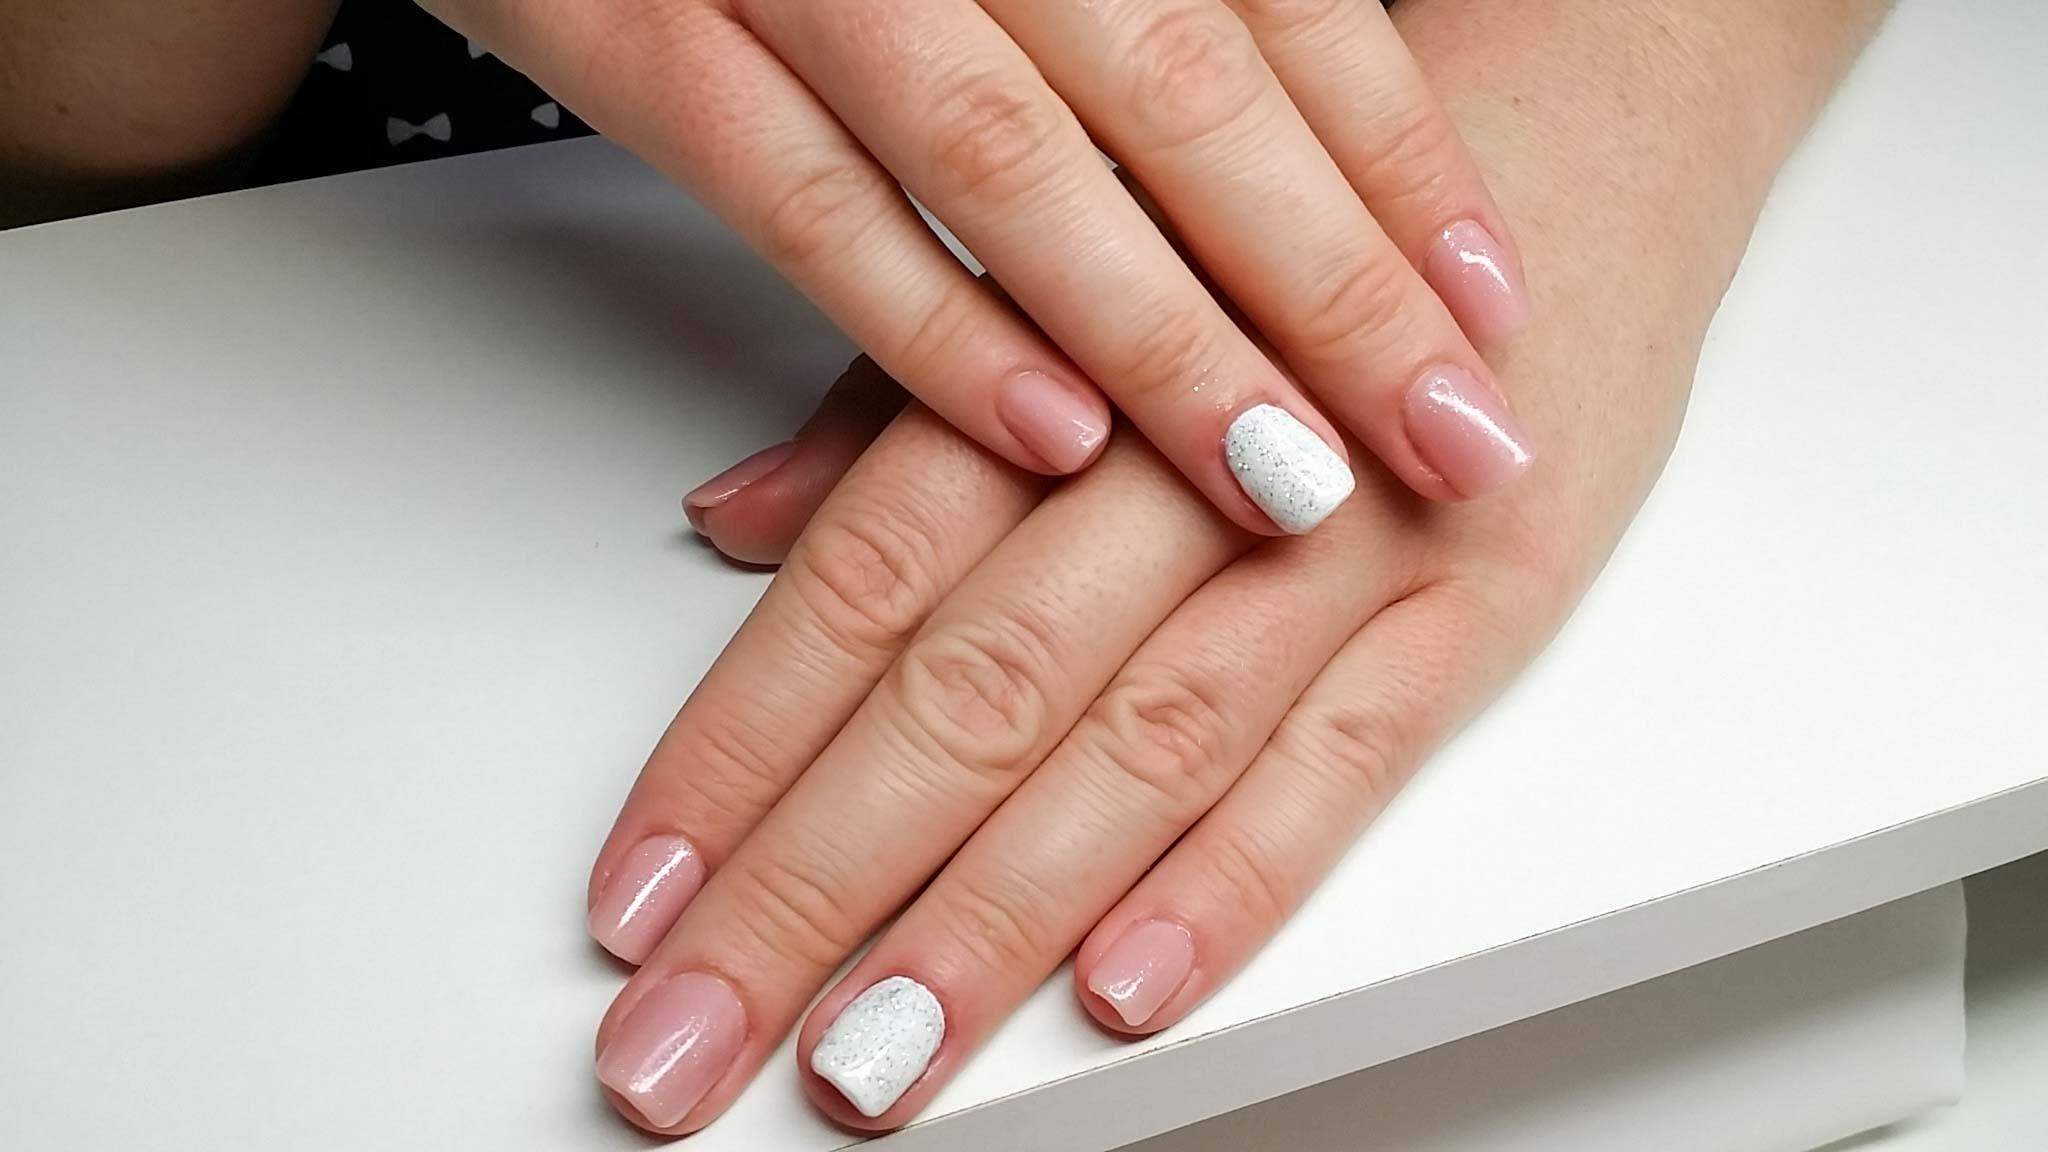 Maniküre  ST Nails Nagelstudio I Maniküre Nageldesign Paraffinbad